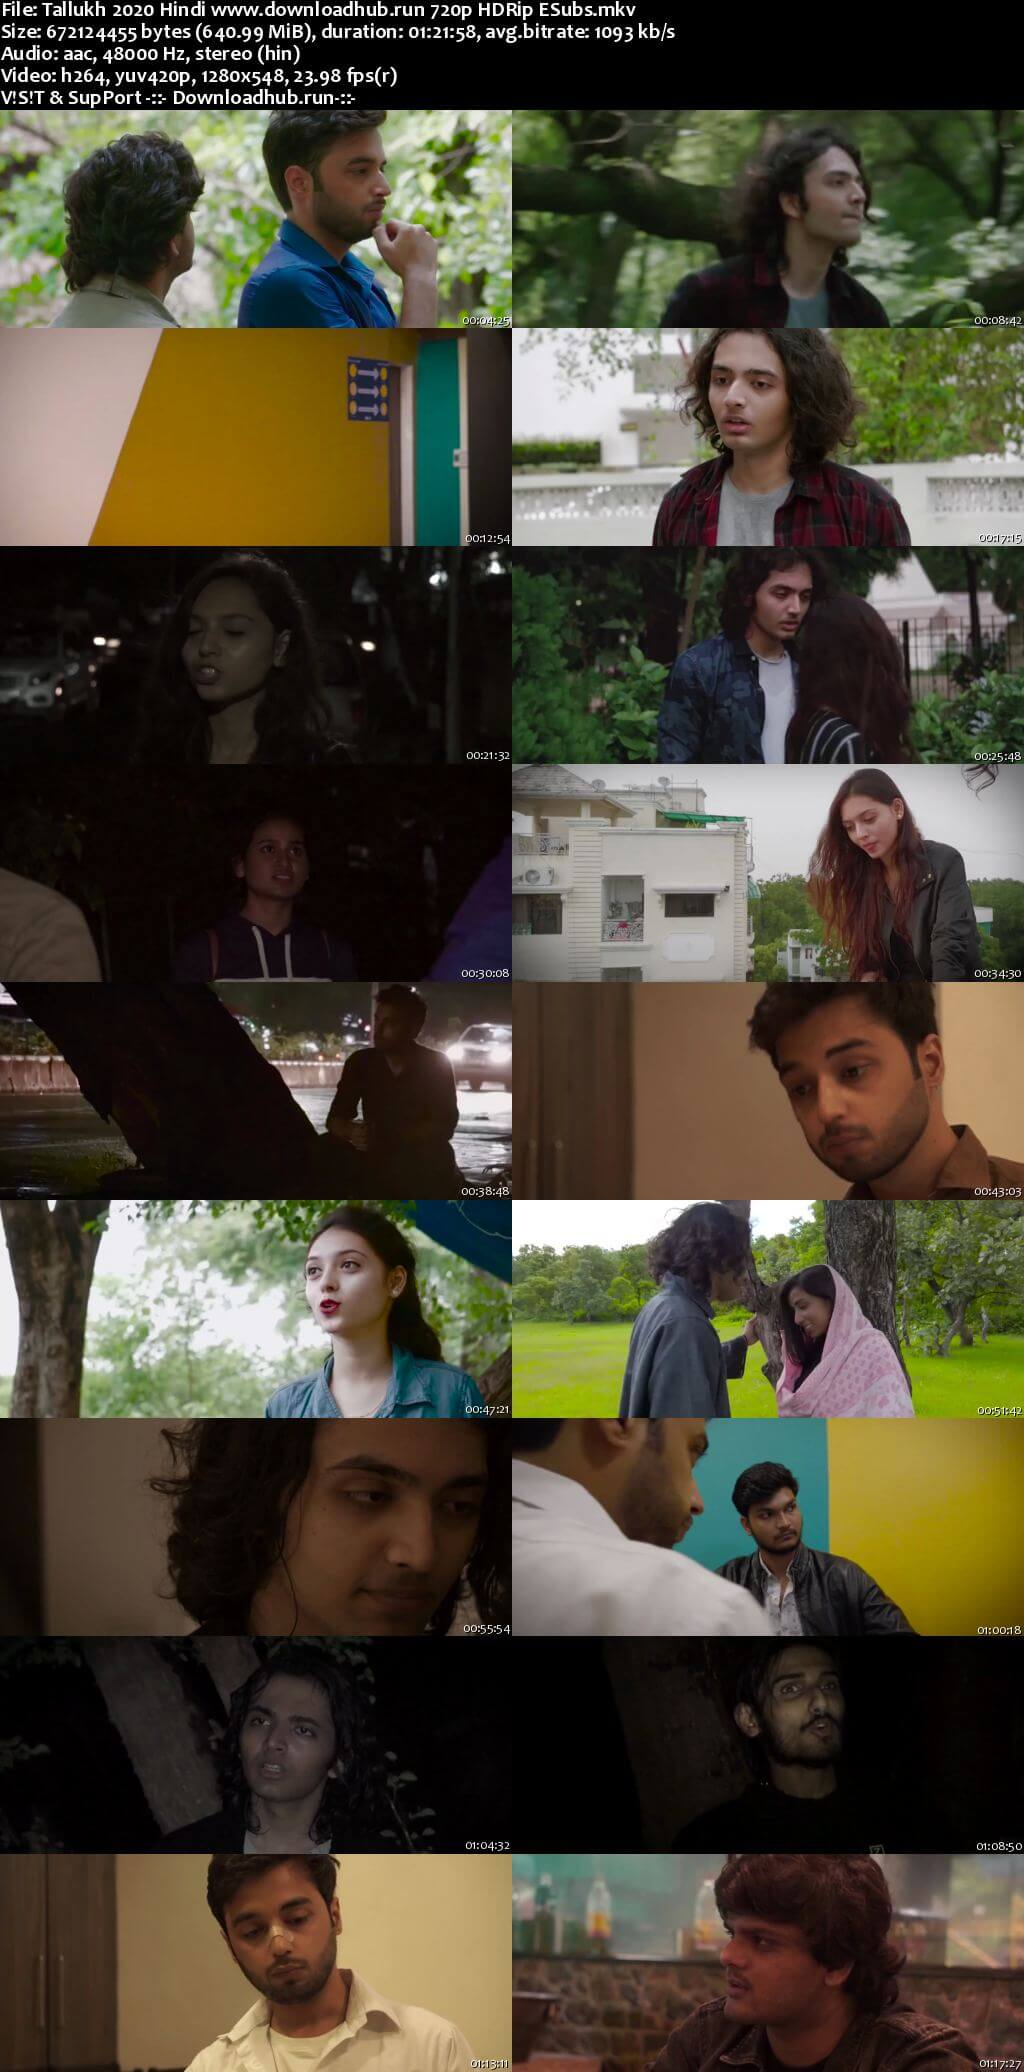 Tallukh 2020 Hindi 720p HDRip ESubs